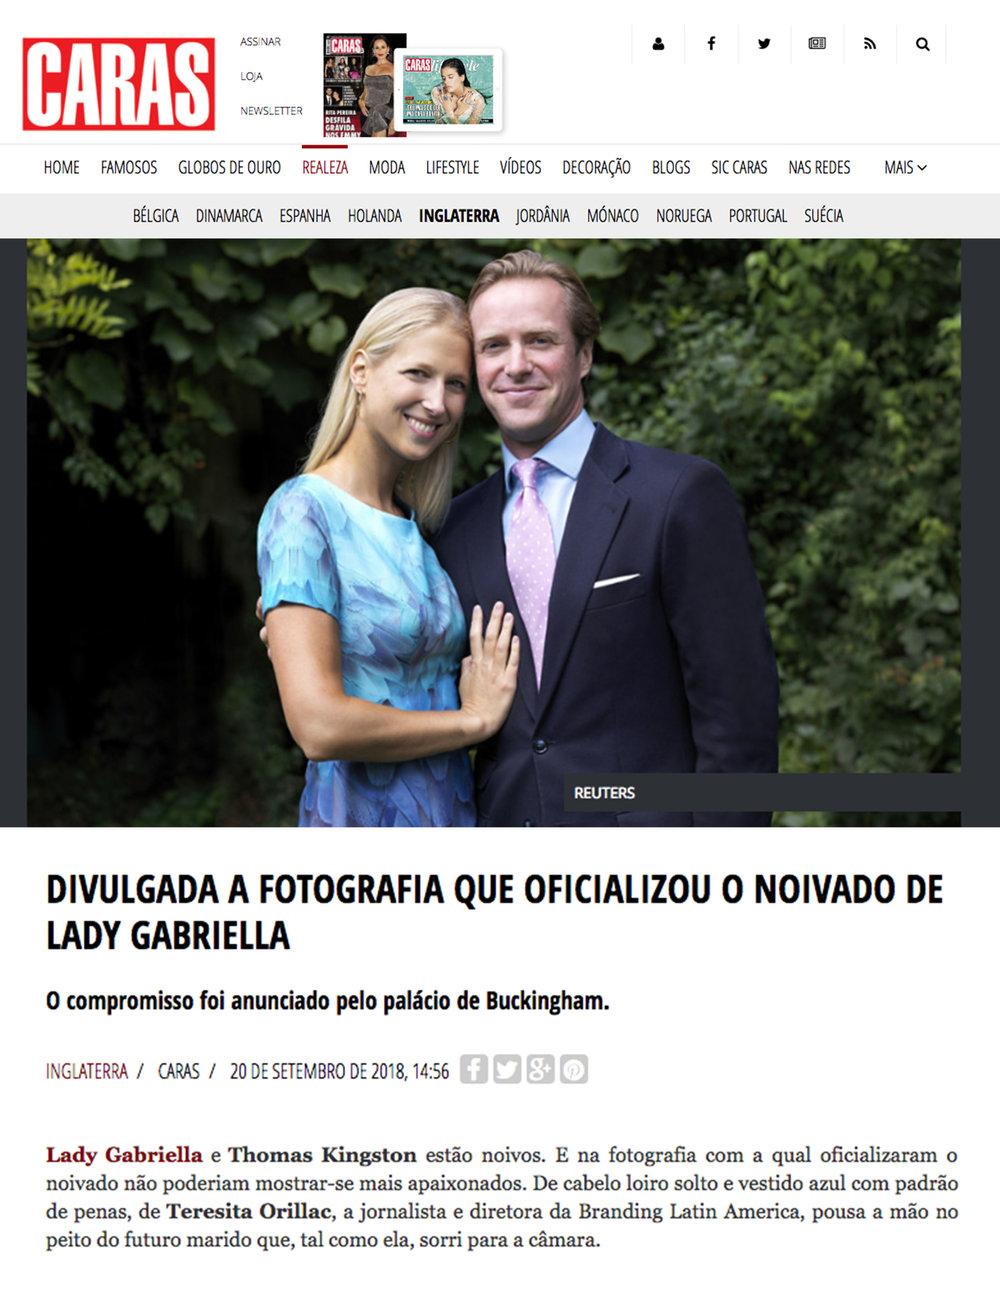 09-18 CARAS portugal.jpg